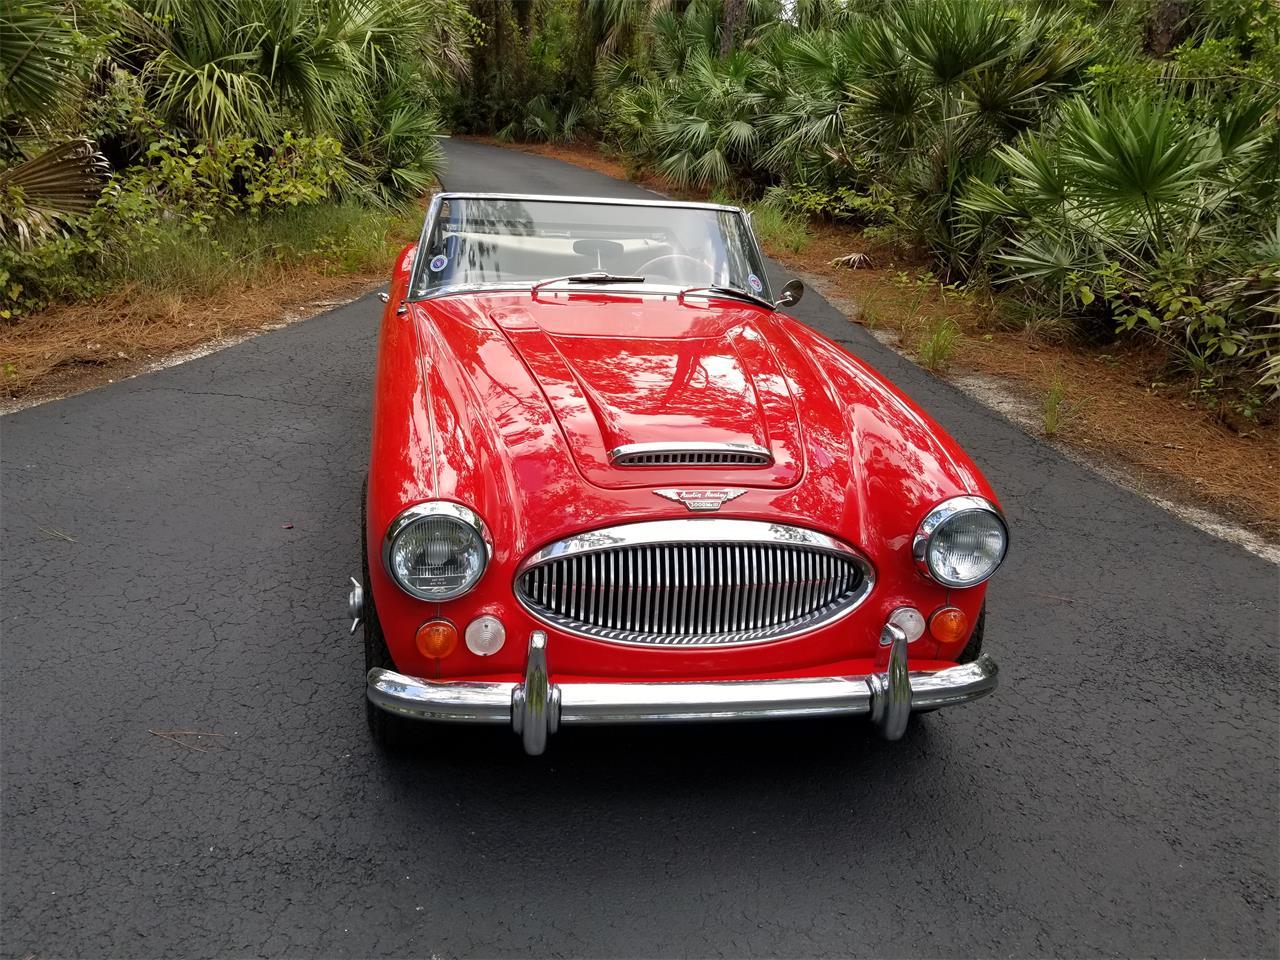 1966 Austin-Healey 3000 Mark III (CC-1243644) for sale in Palm Bay, Florida